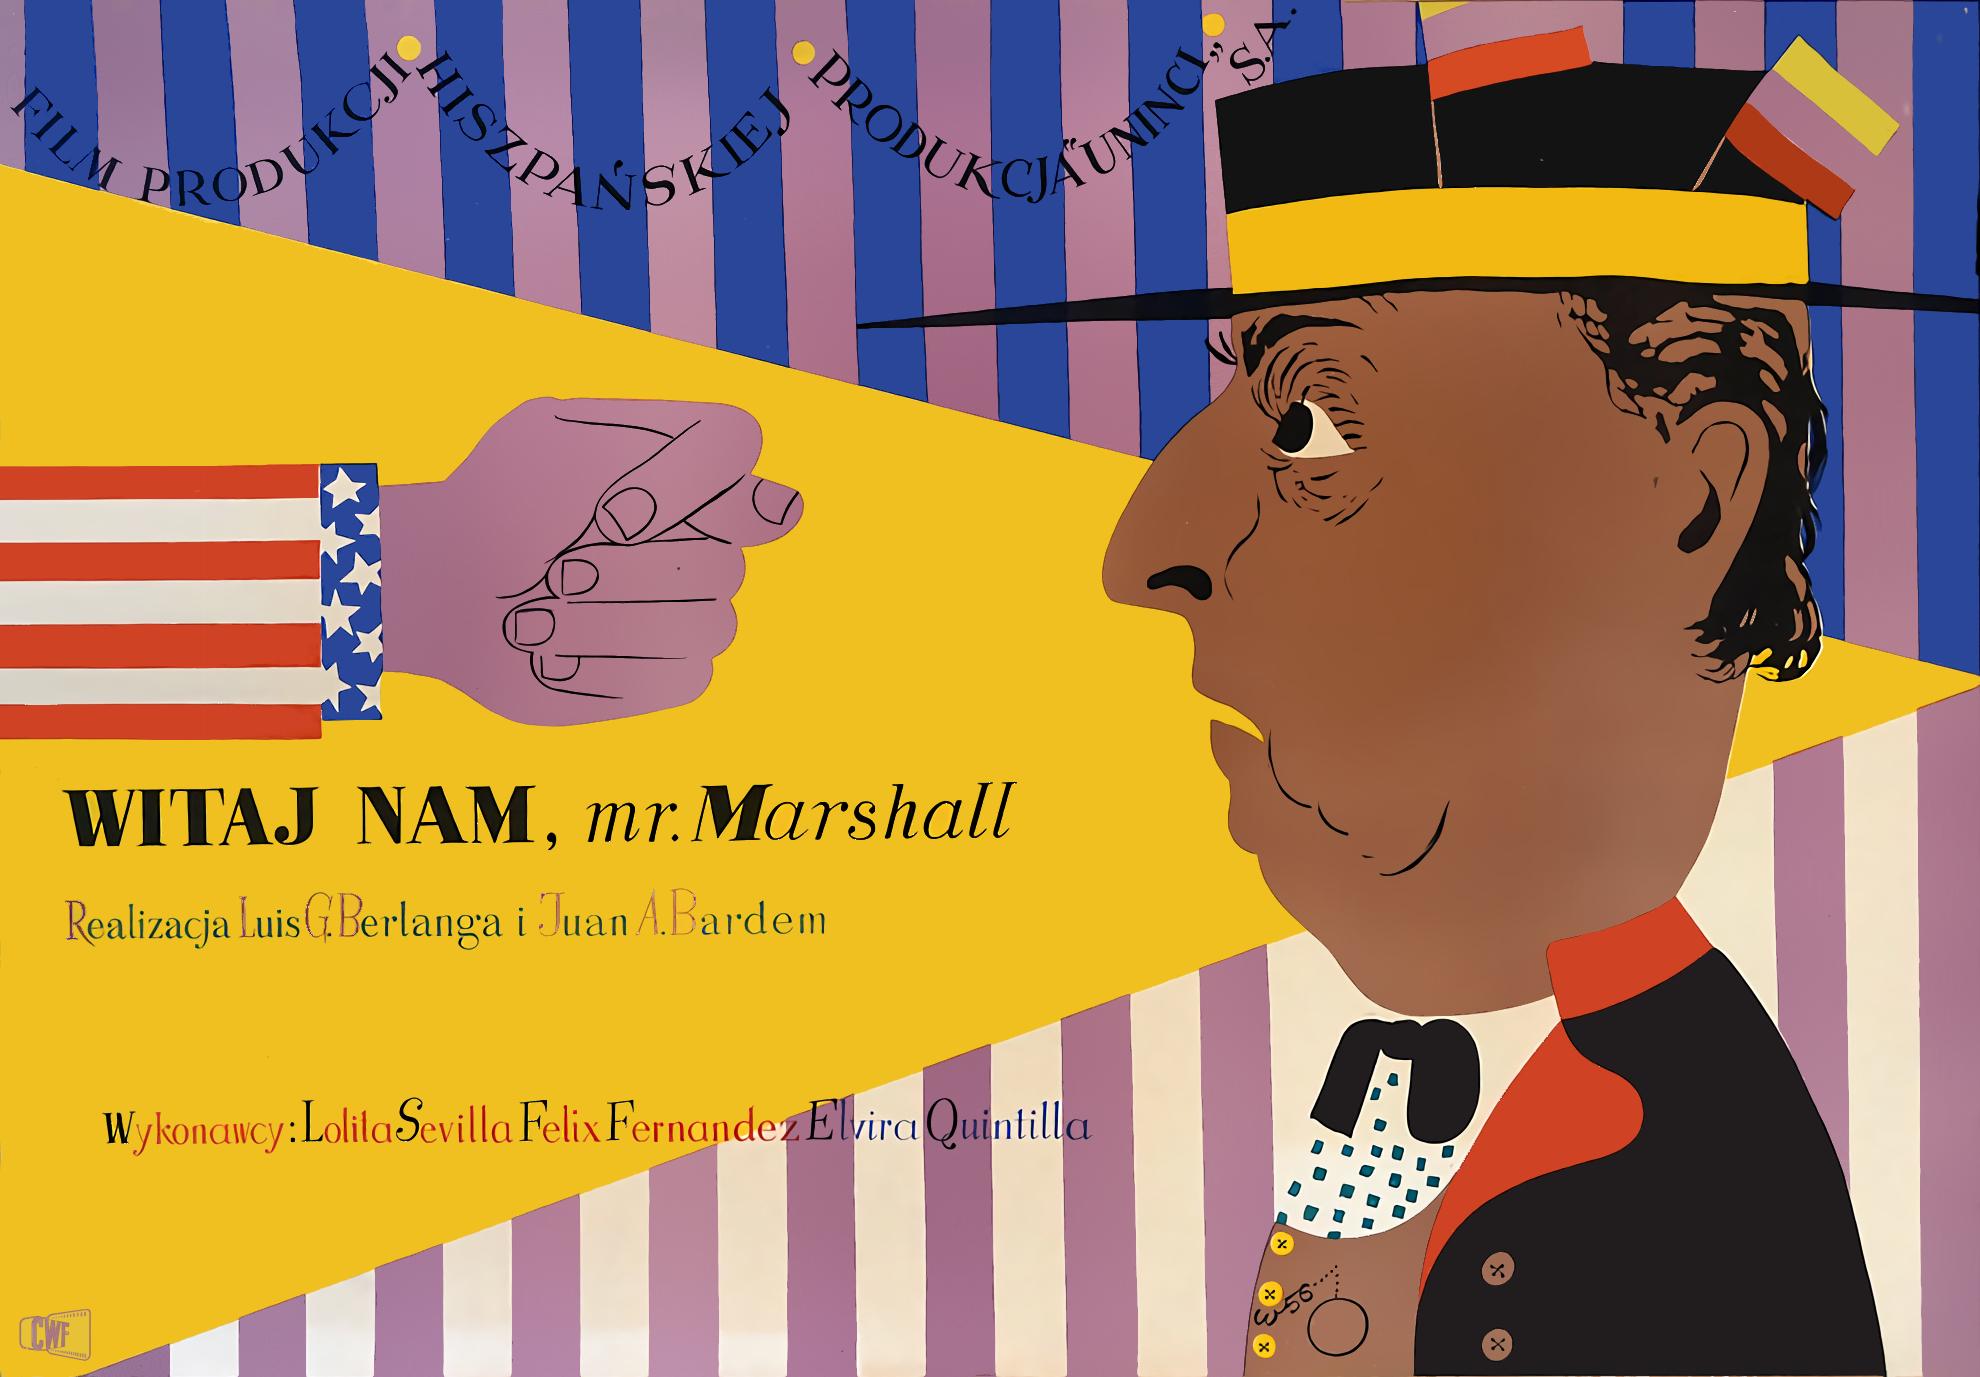 Witaj nam, mr. Marshall!